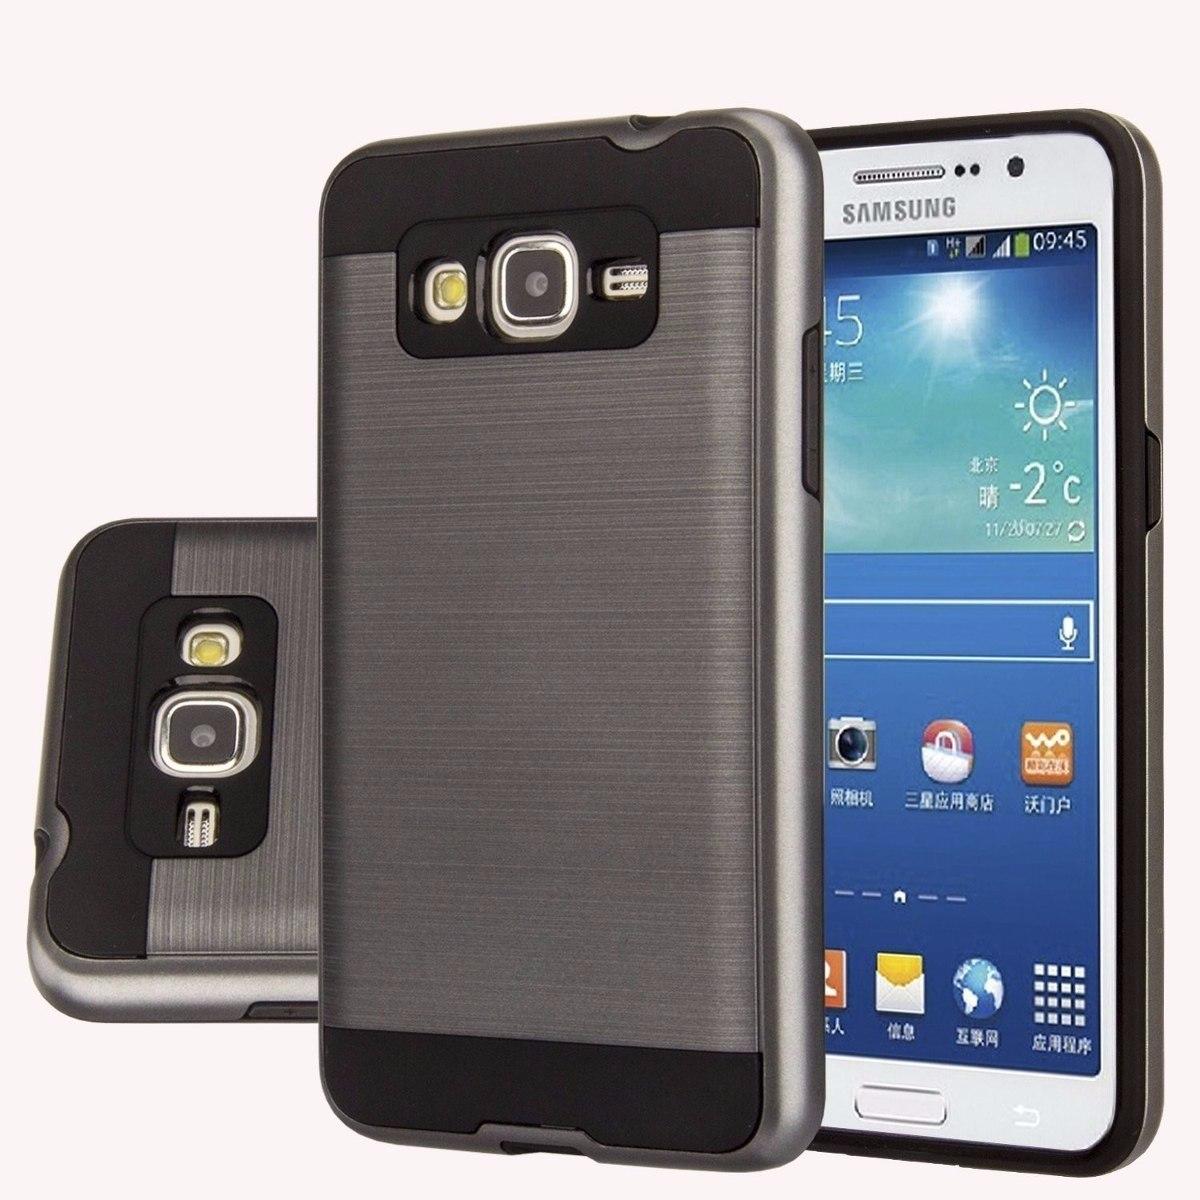 c925e9042c6 Funda Rigida Metalizada P/ Samsung J7 Prime + Templado - $ 249,99 en ...